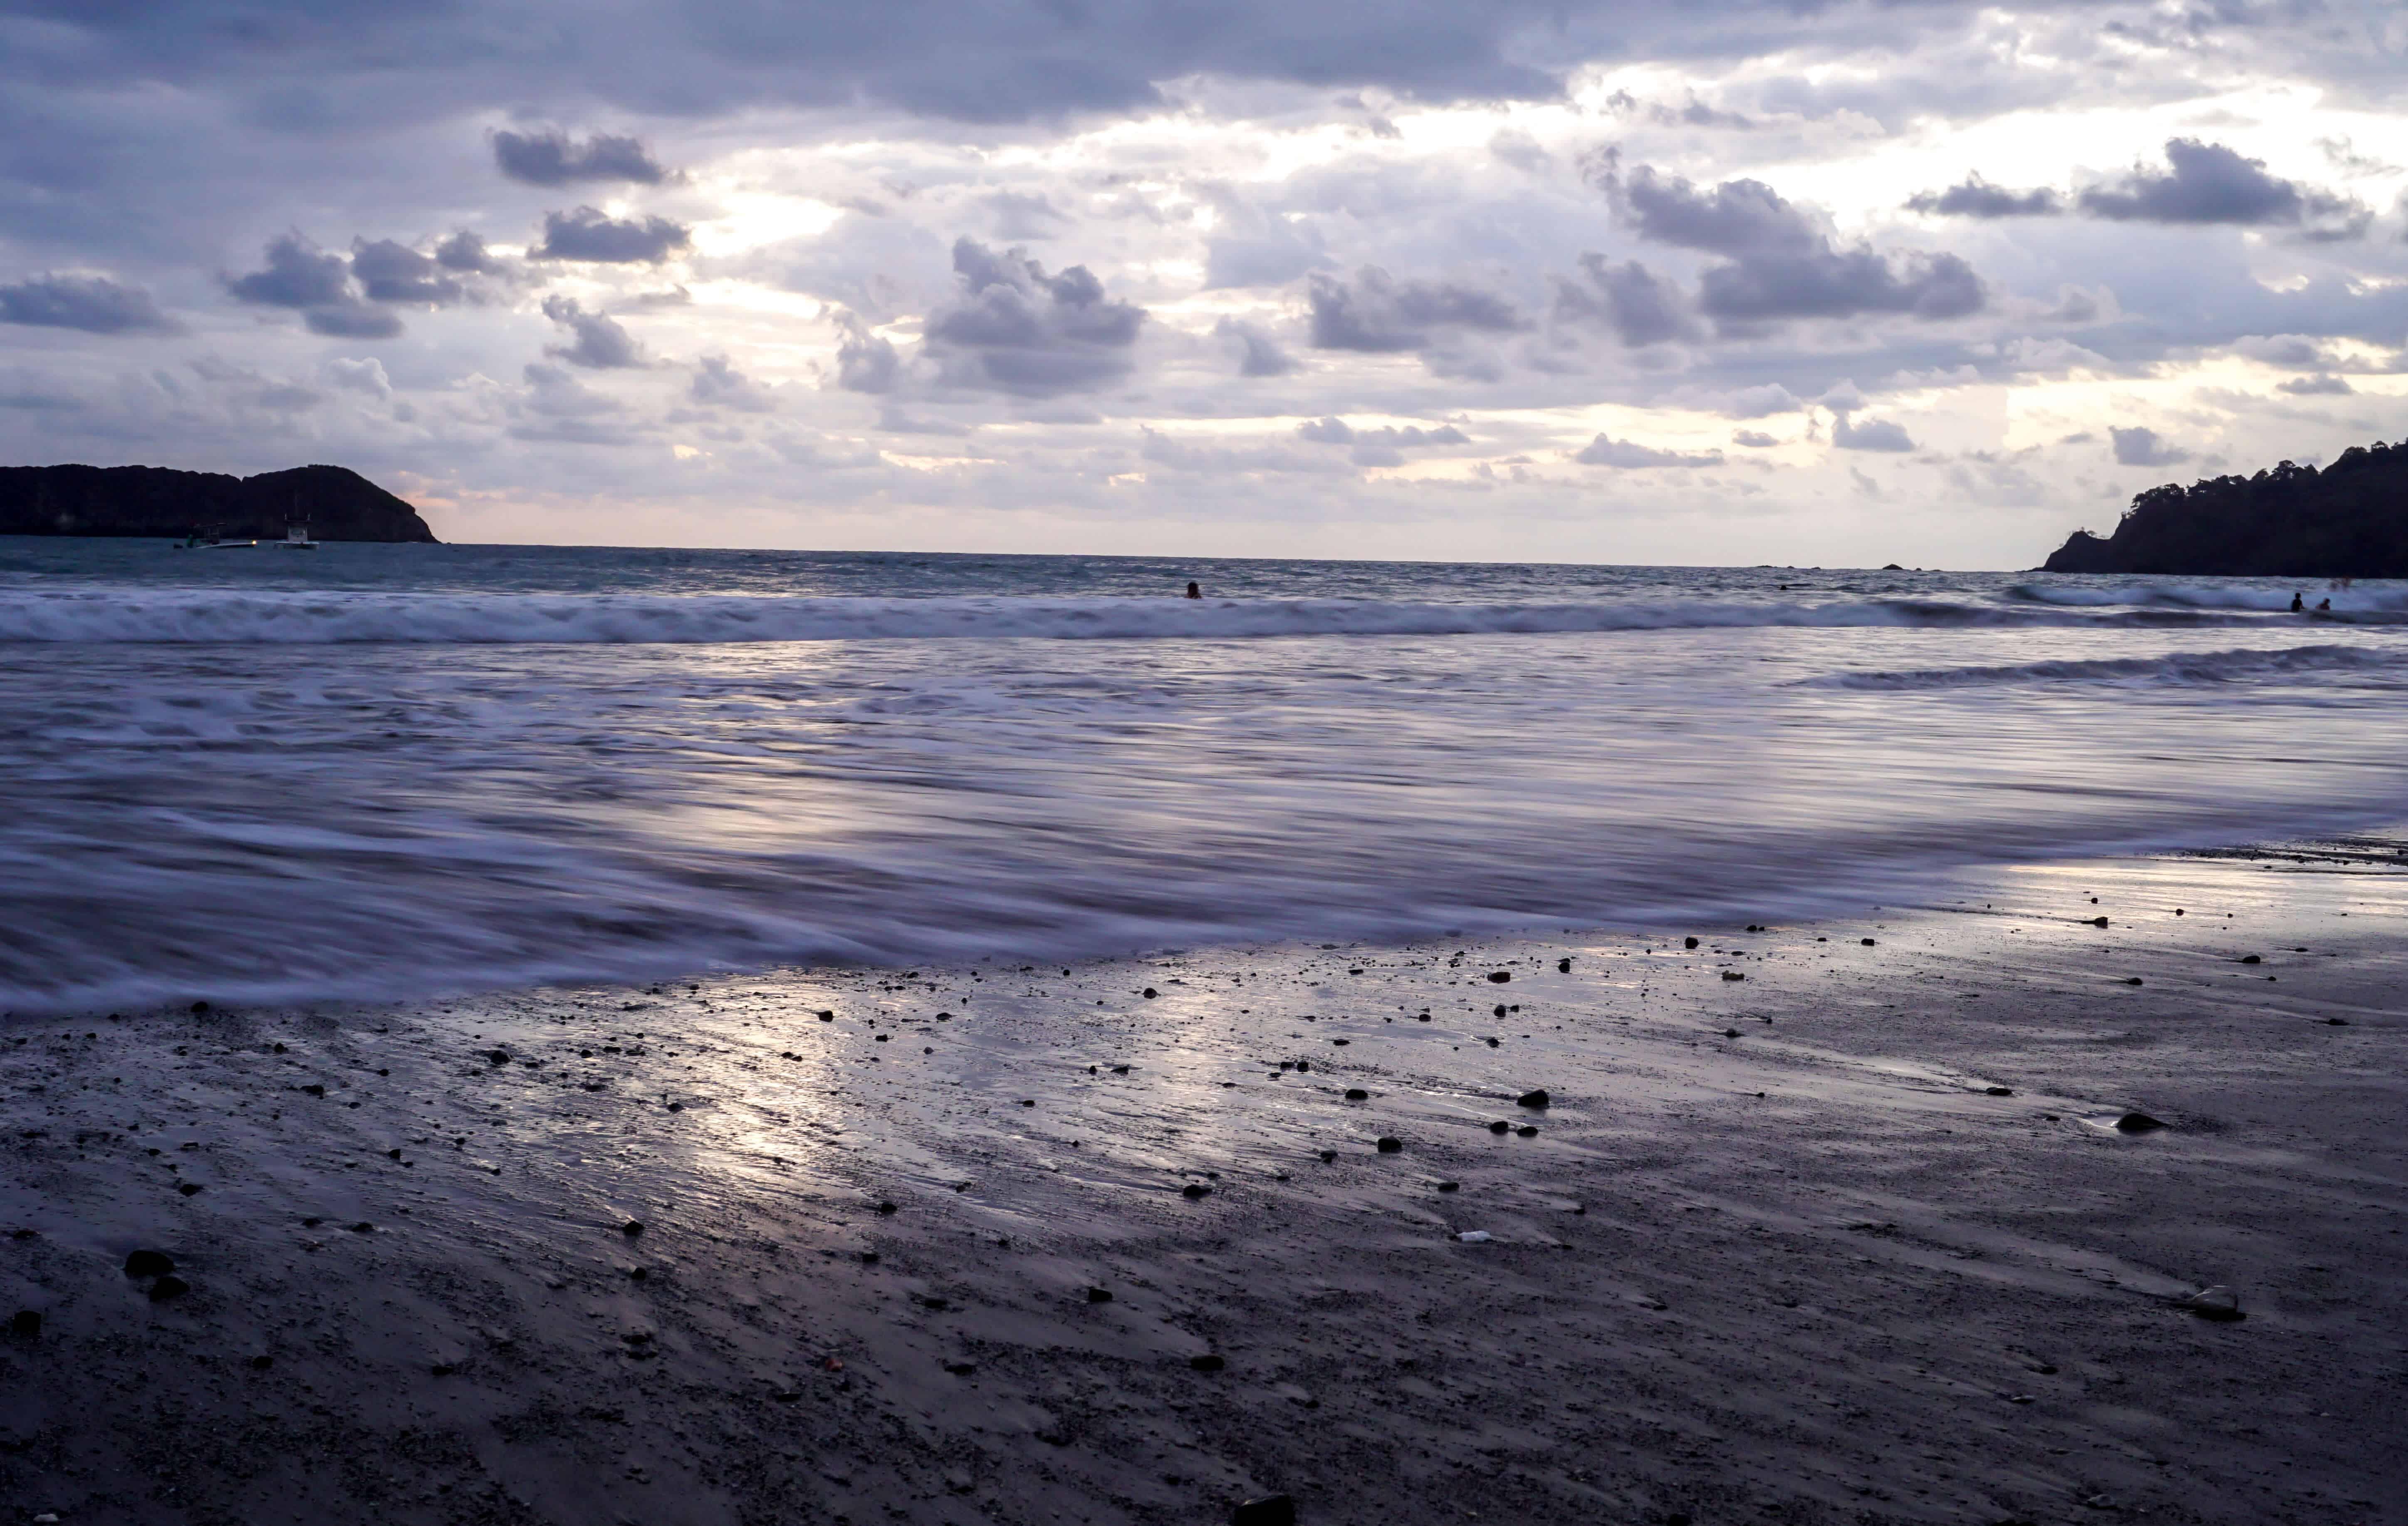 purple sunset in costa rica